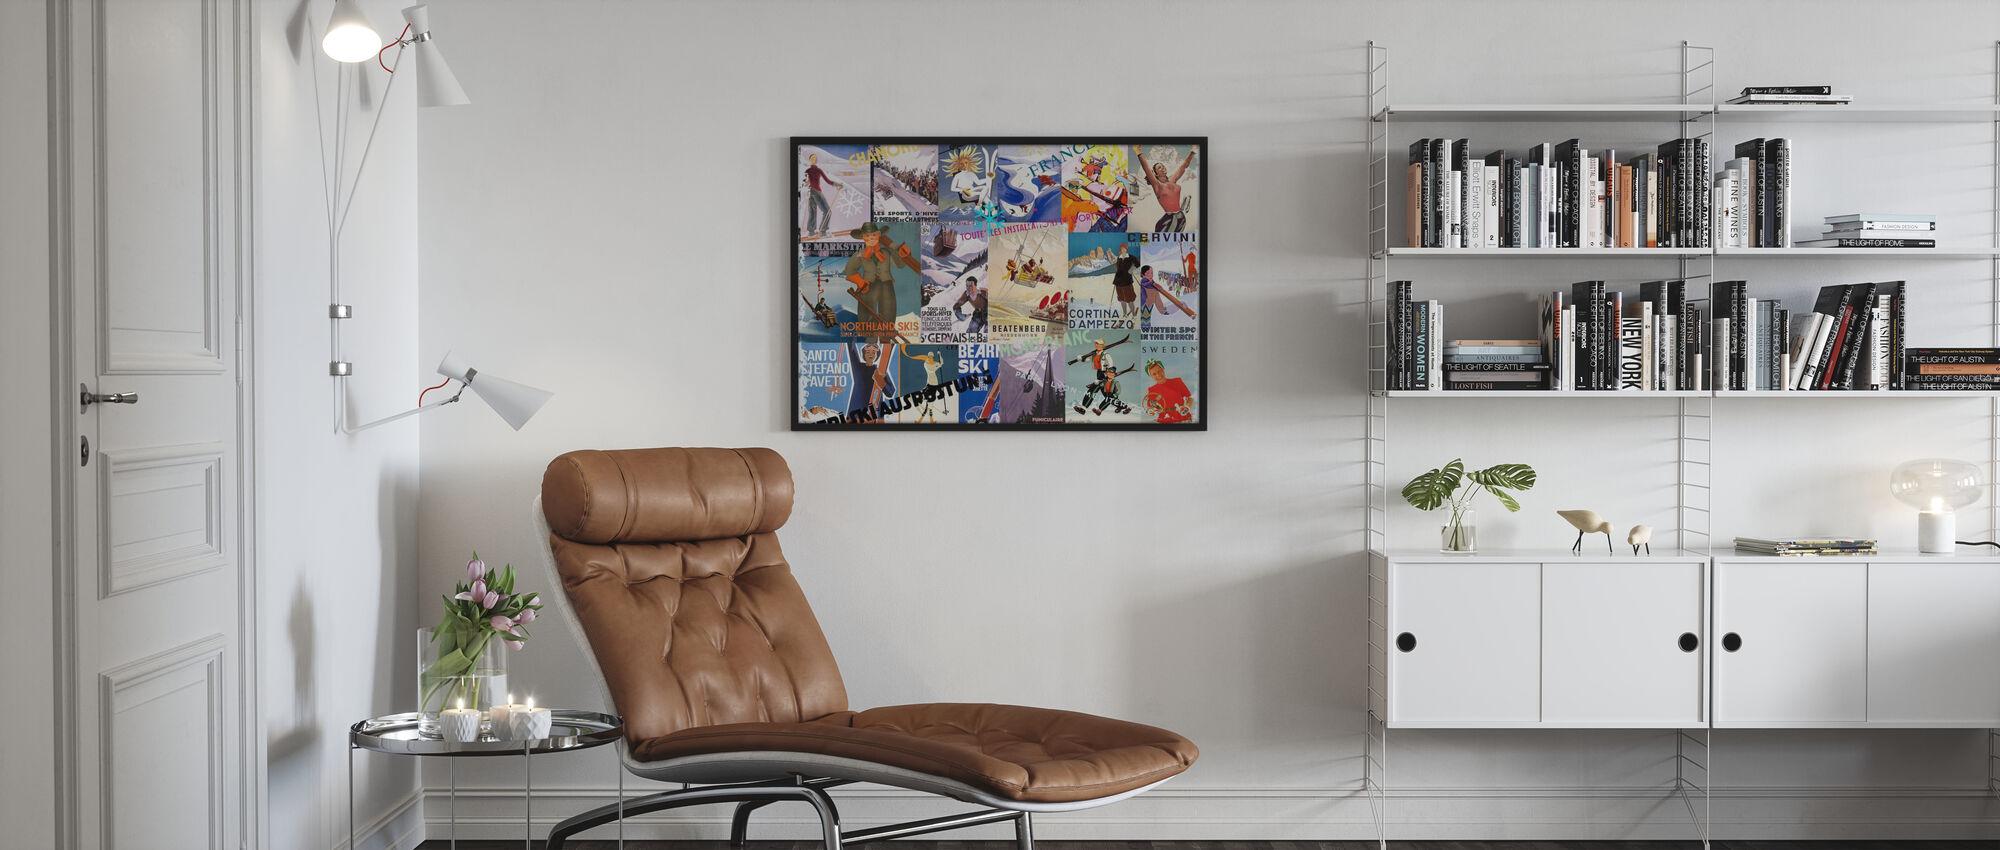 Ski Resorts Collage - Poster - Living Room